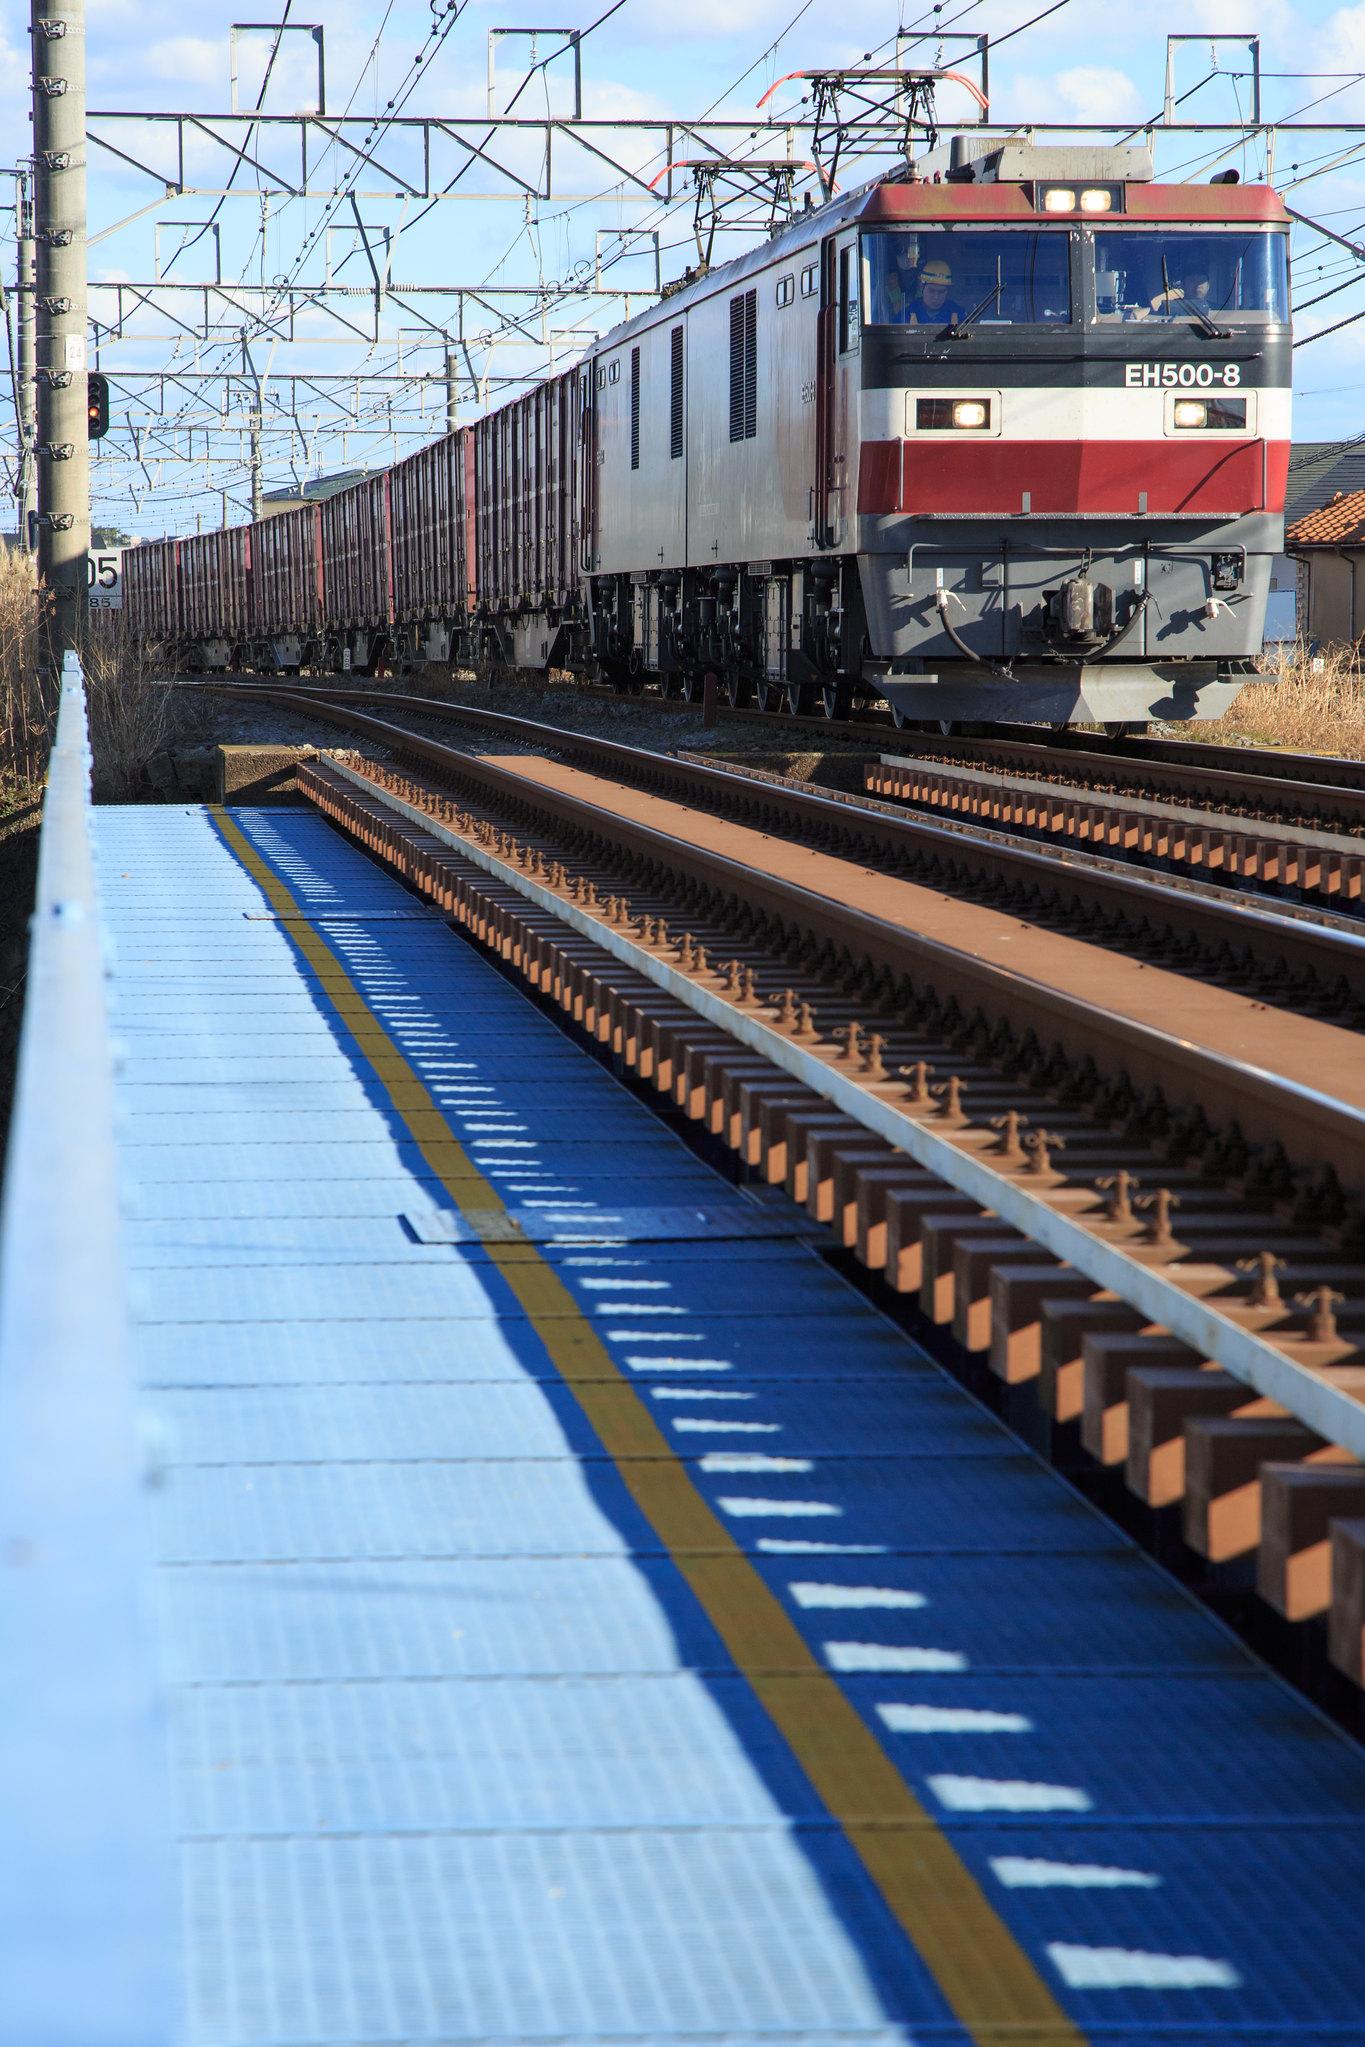 EH500 8 / Tokaido Line